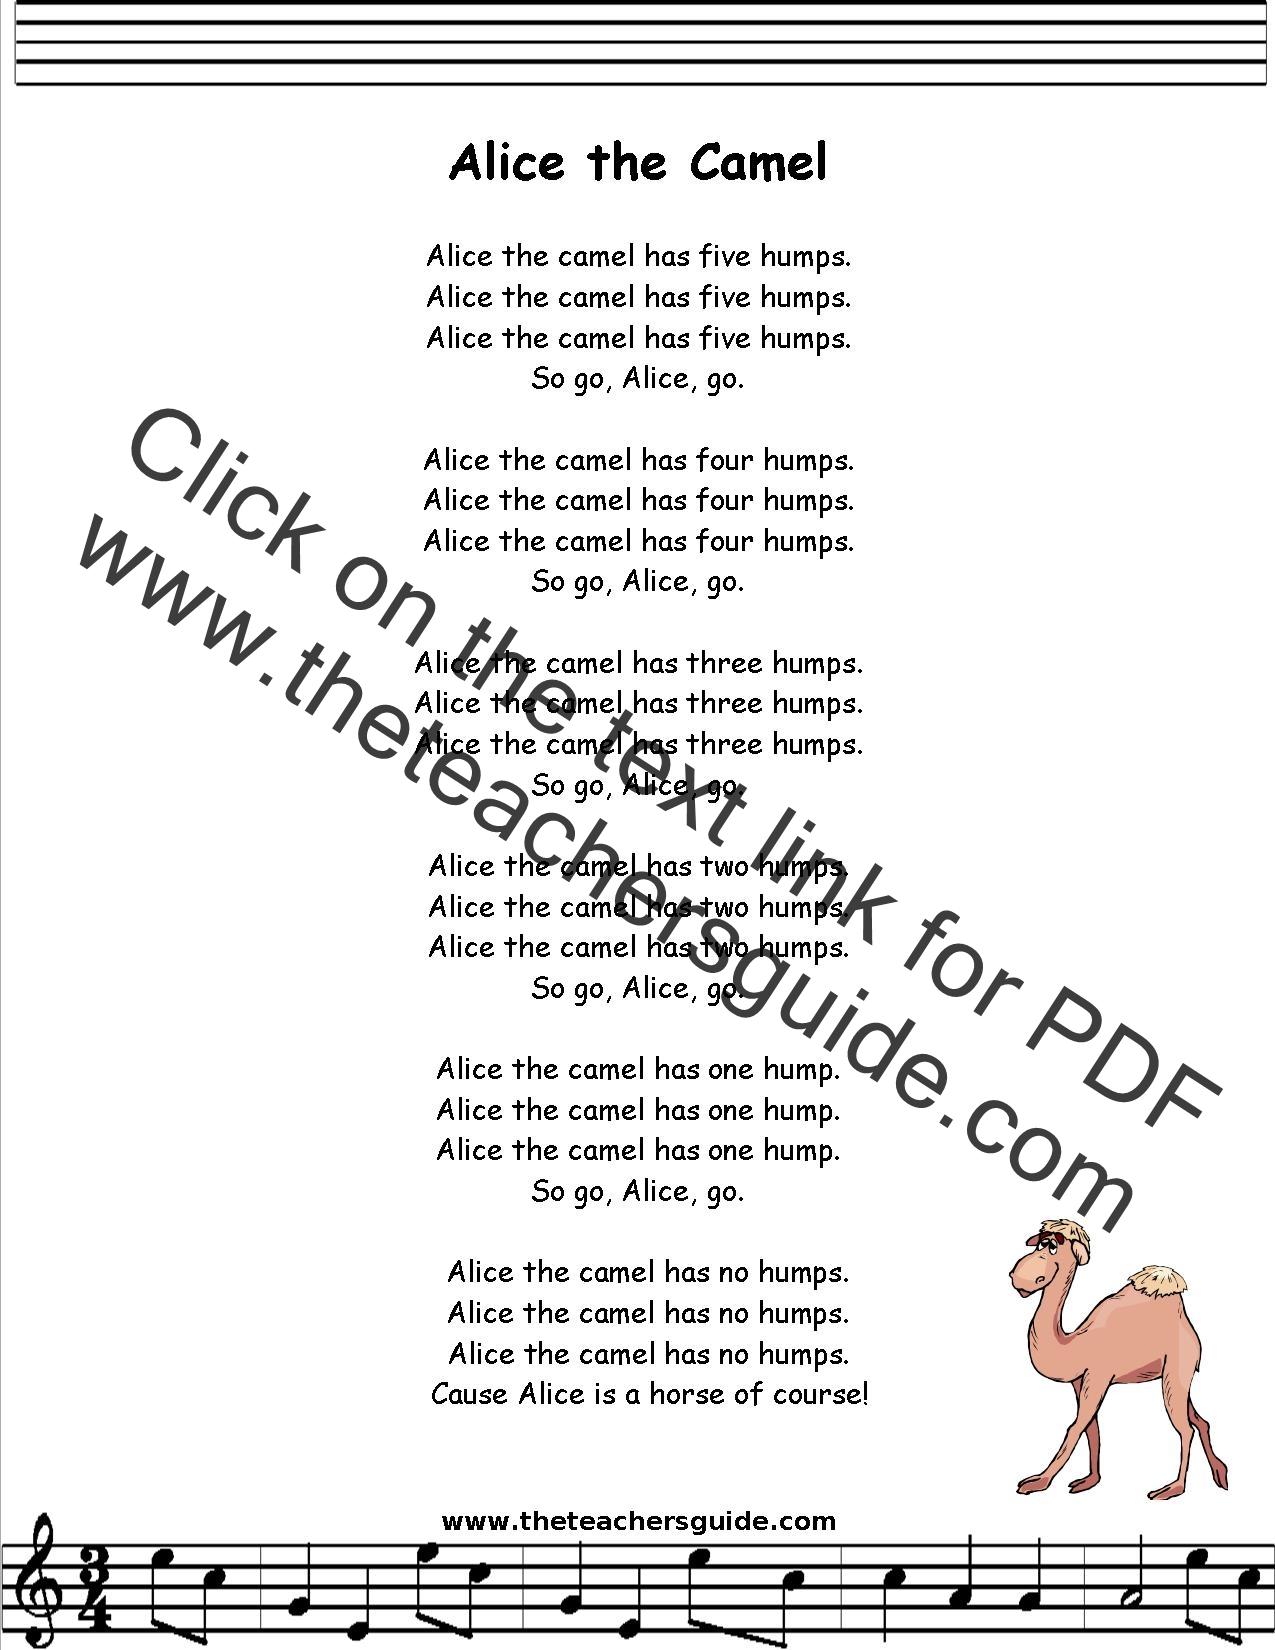 Children Songs - Alice The Camel Lyrics | MetroLyrics